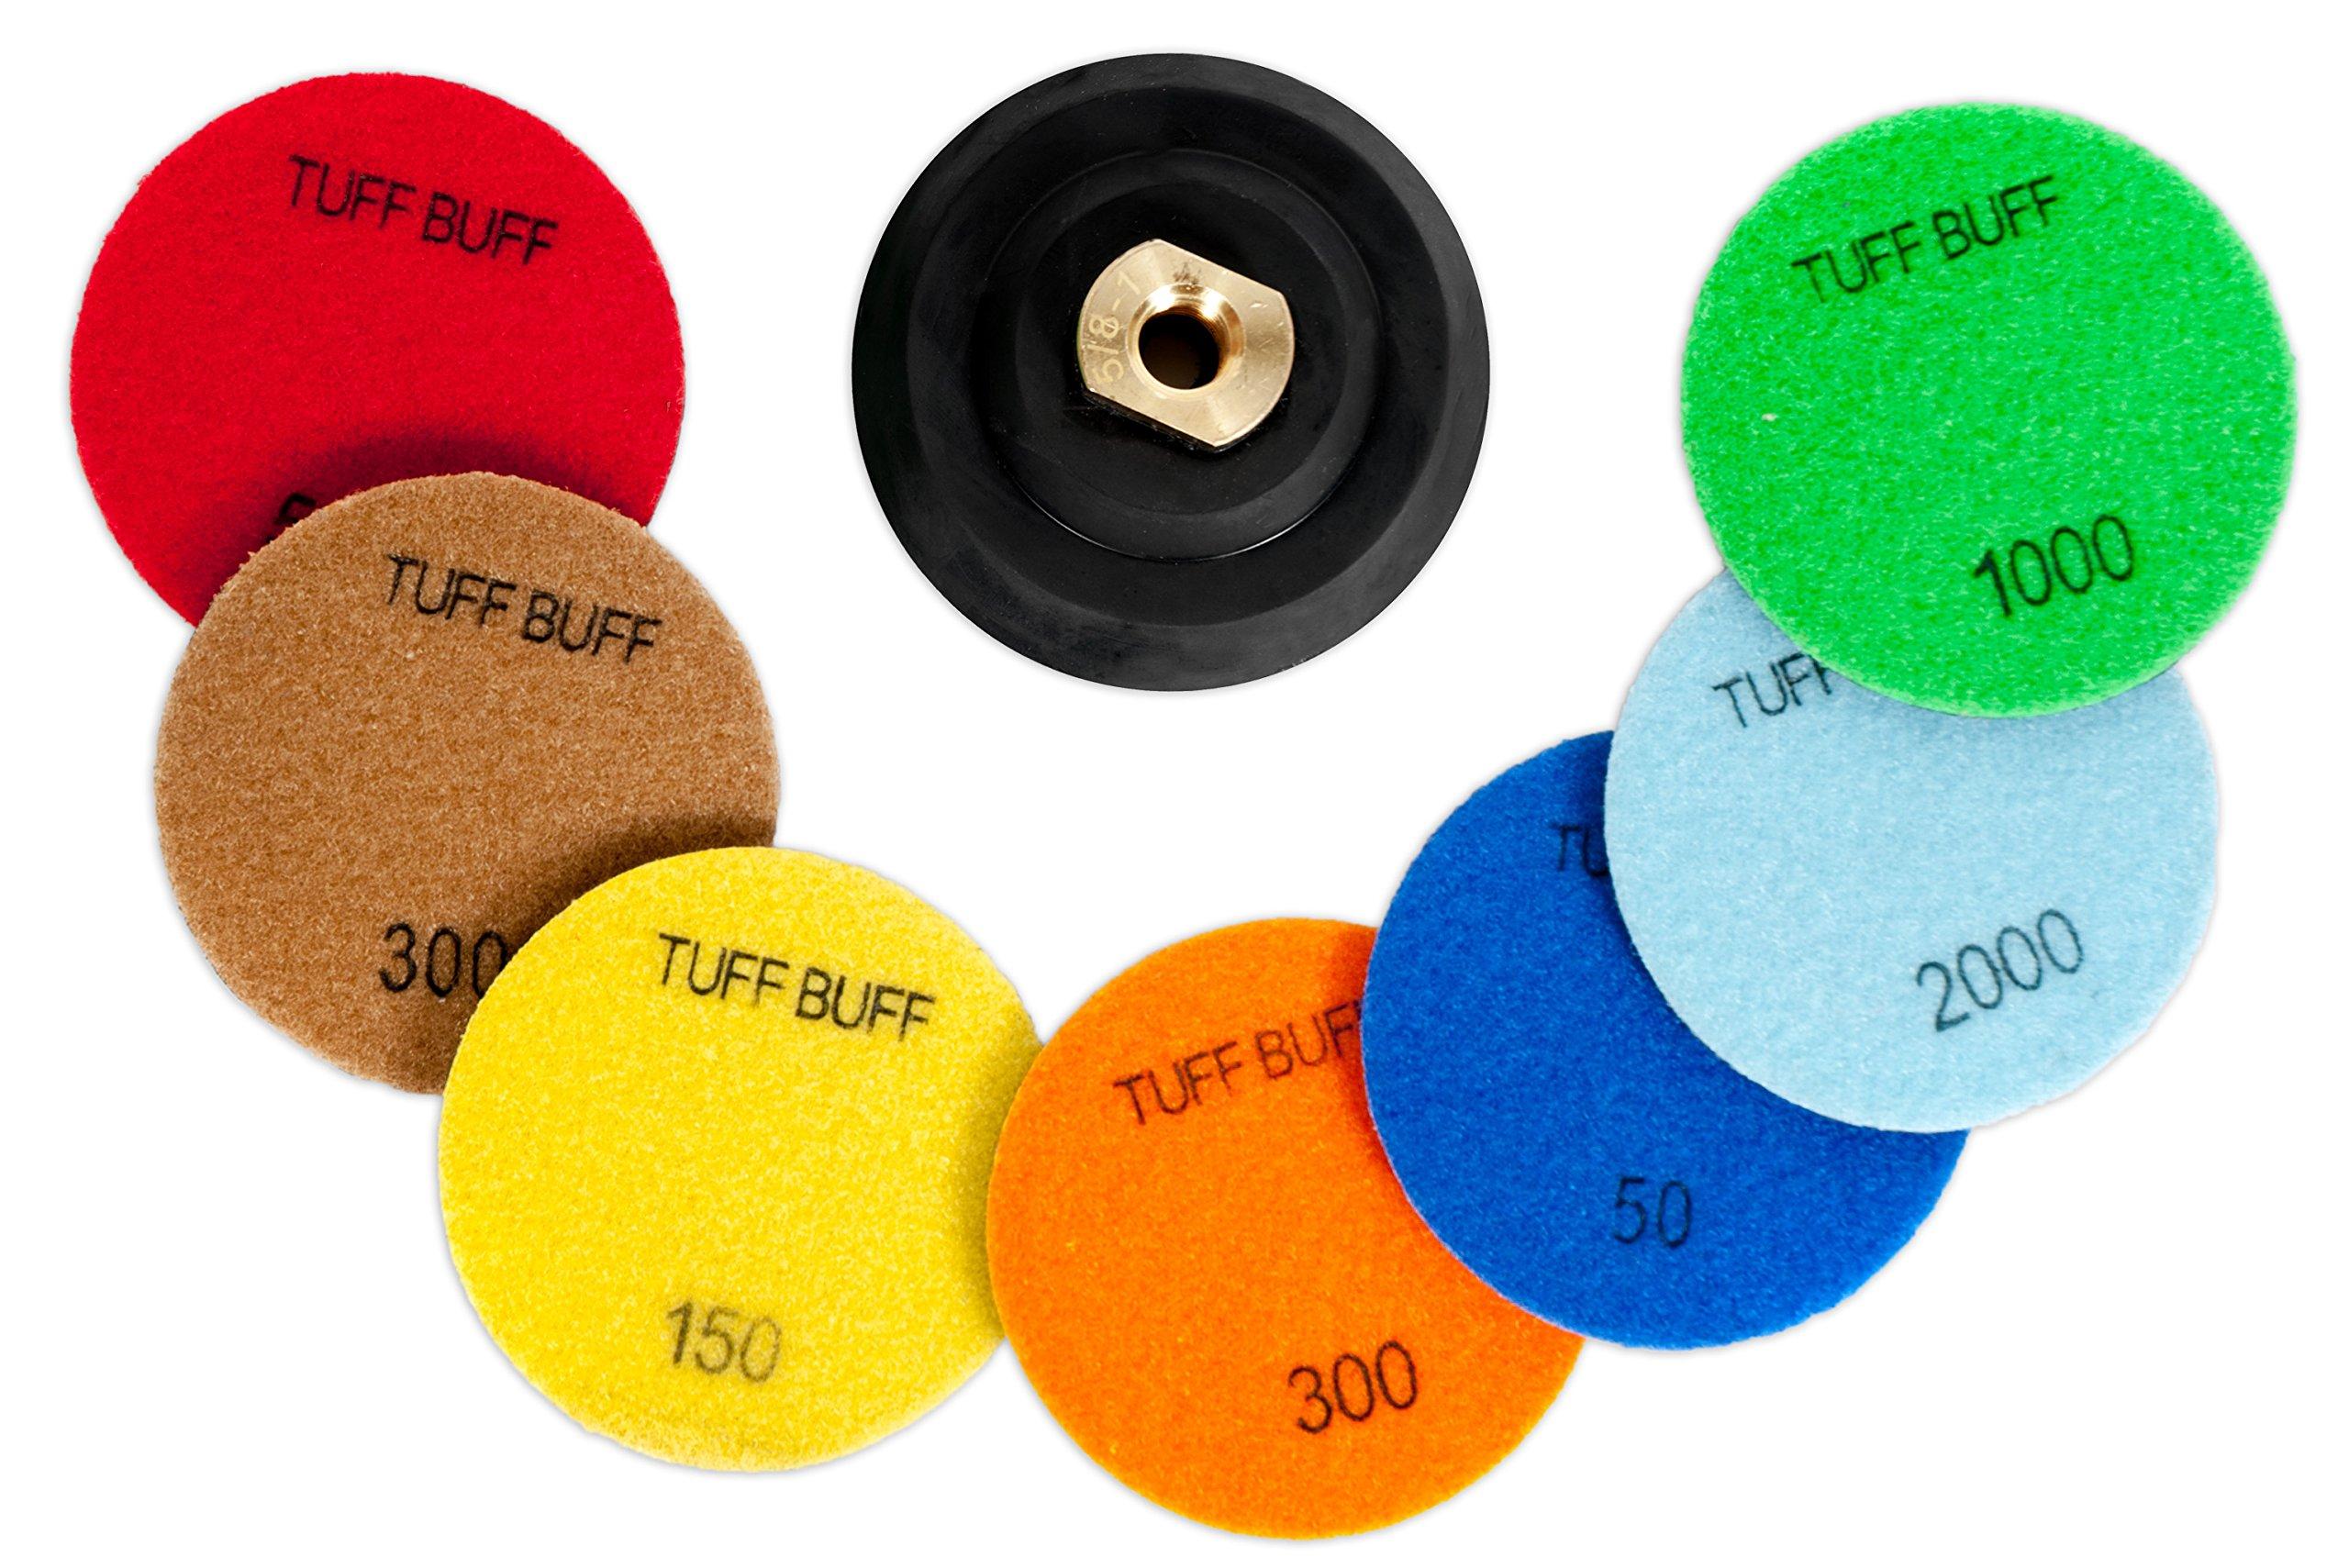 TUFF BUFF - Wet/Dry Diamond Polishing Pads - 11 Piece Set with Rubber Backer for Granite, Stone, Concrete, Marble, Travertine, Terrazzo- 4'' Inch Pads by Tuff Buff (Image #4)